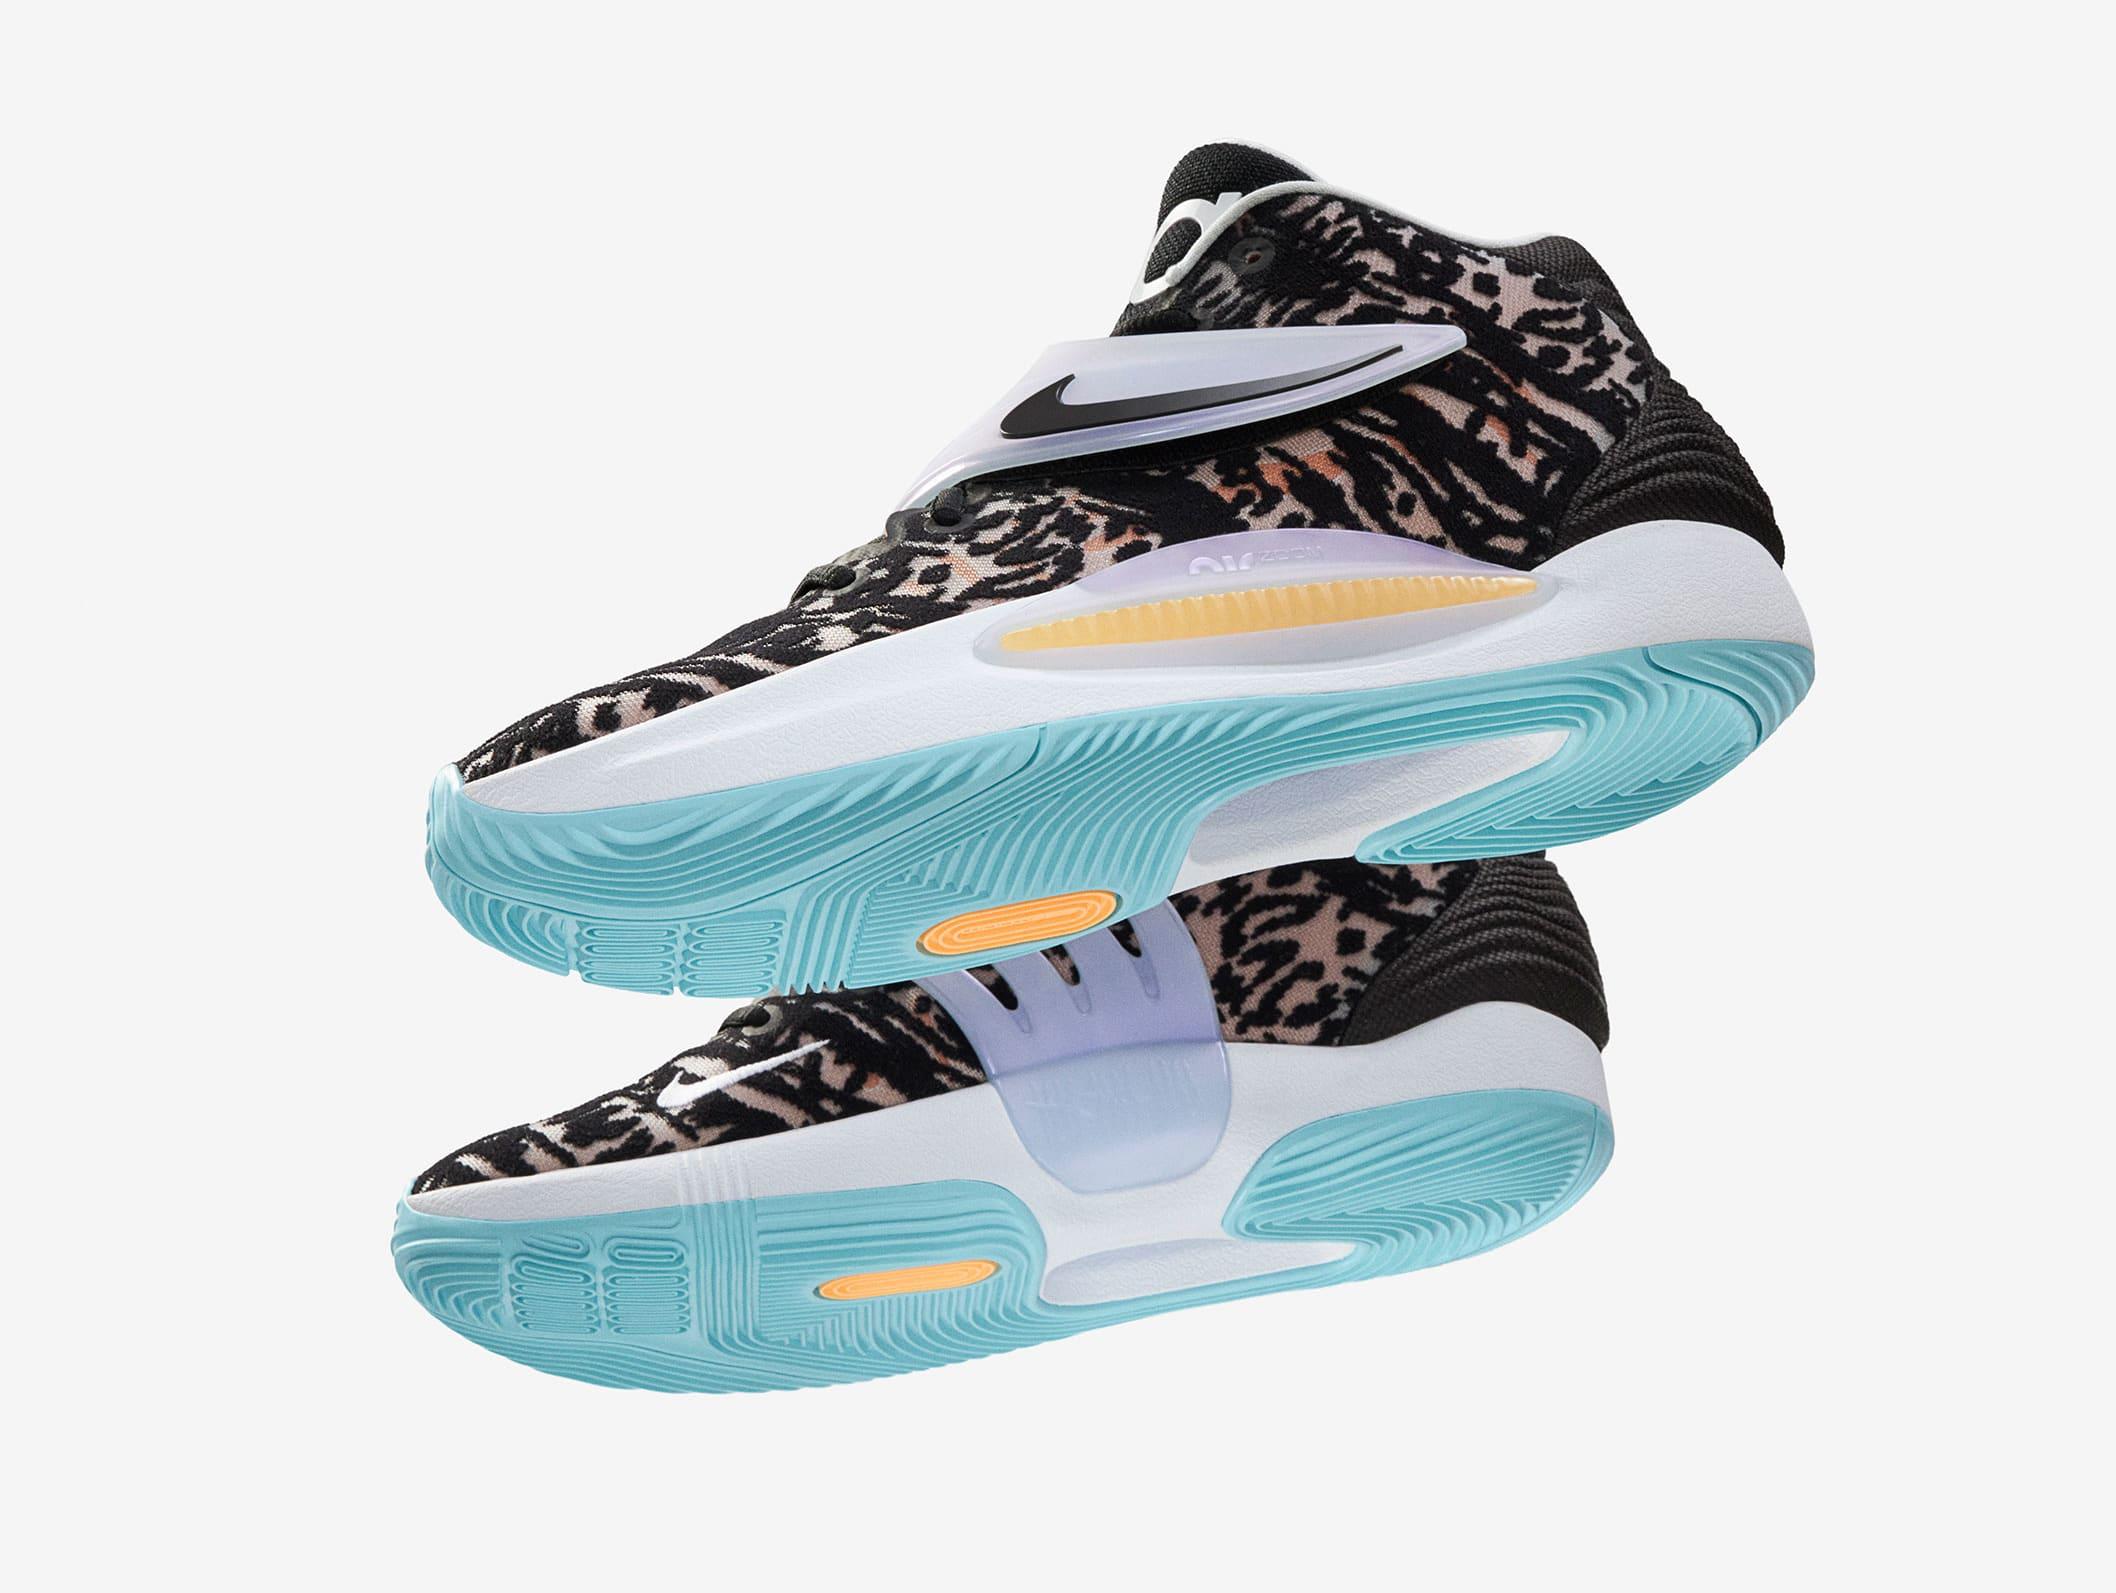 Nike KD 14 Pair